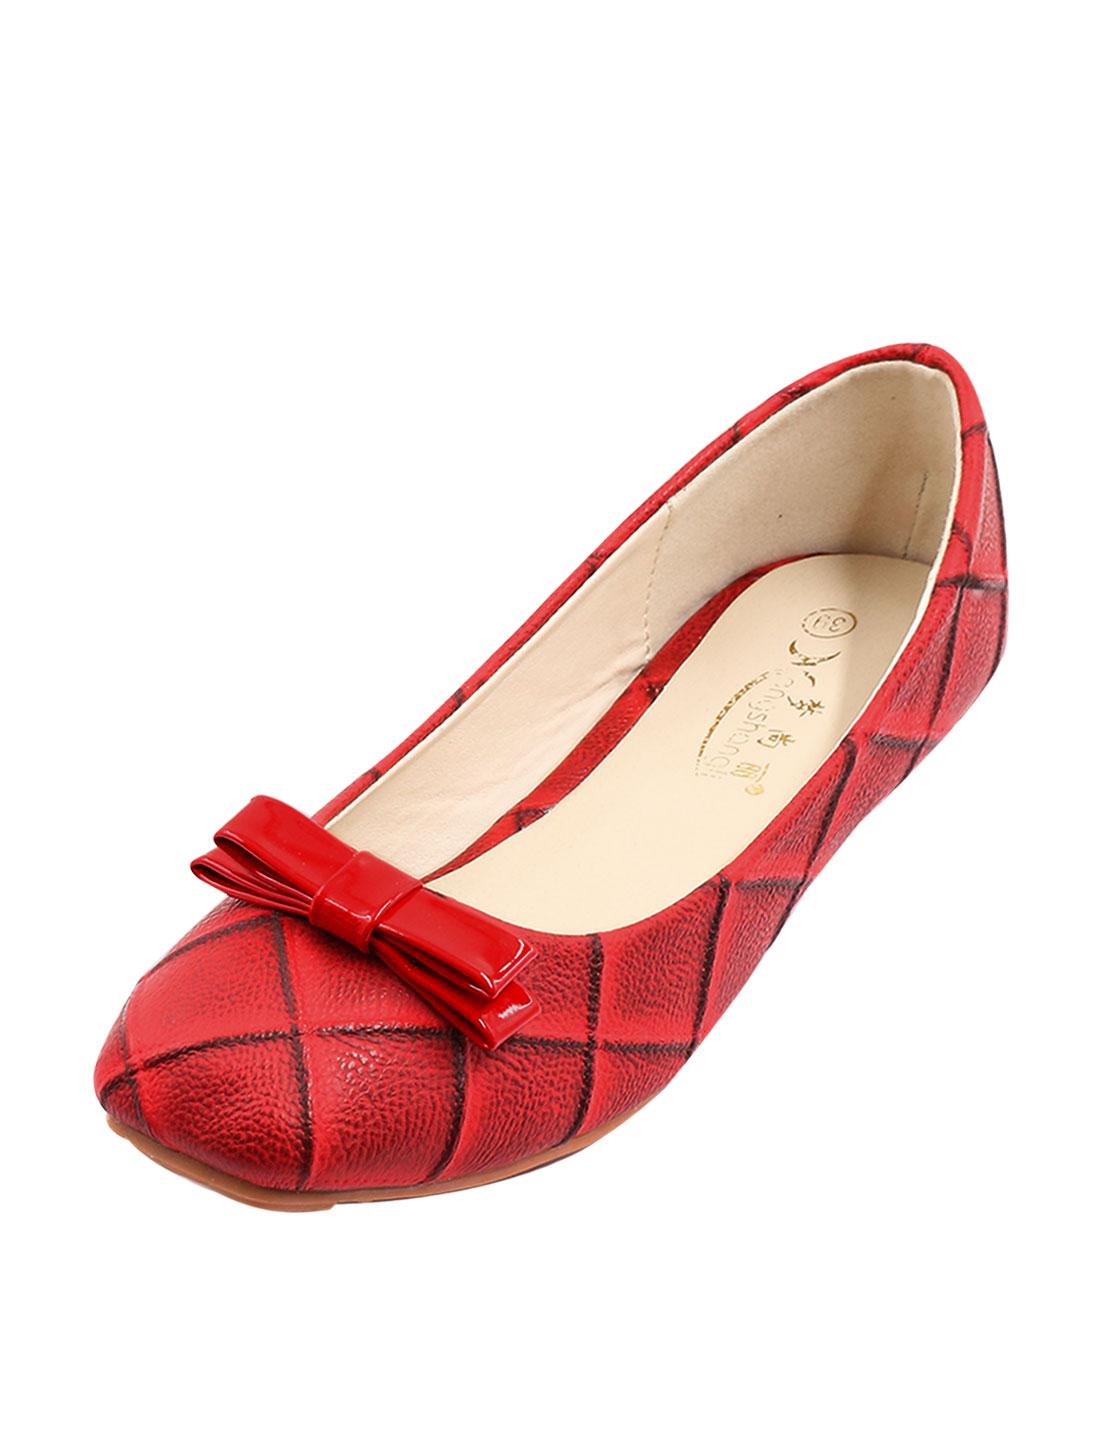 Lady Bowknot Decor Square Toe Argyle Pattern Leisure Flat Pumps Red US 9